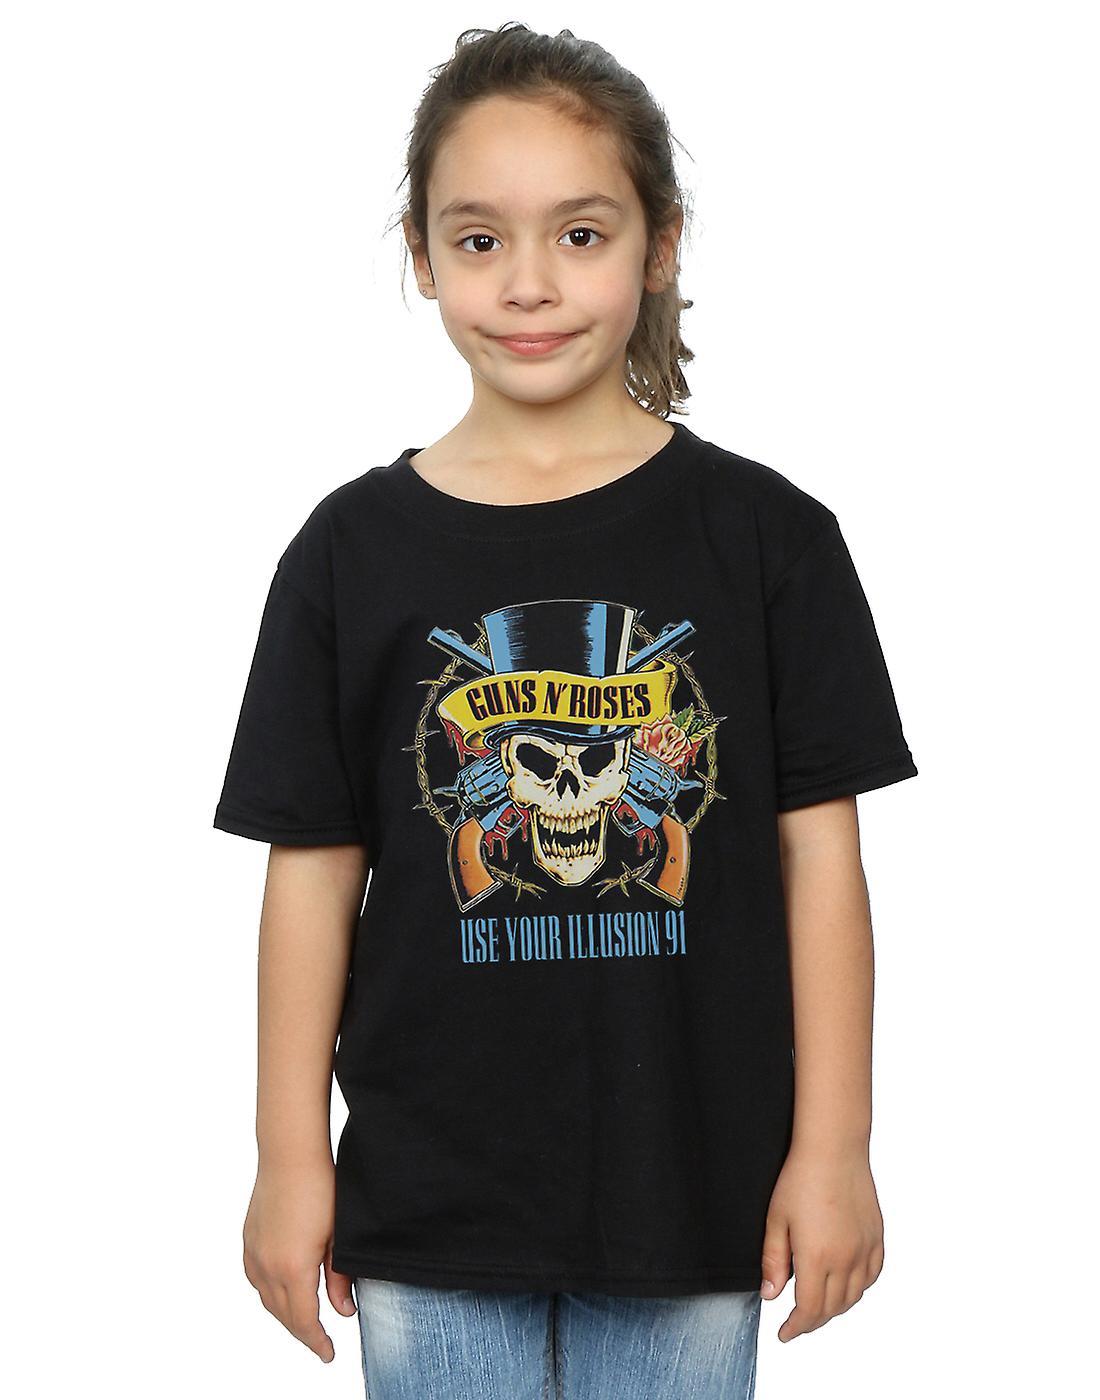 Guns N Roses meisjes gebruiken uw illusie 91 Tour T-Shirt